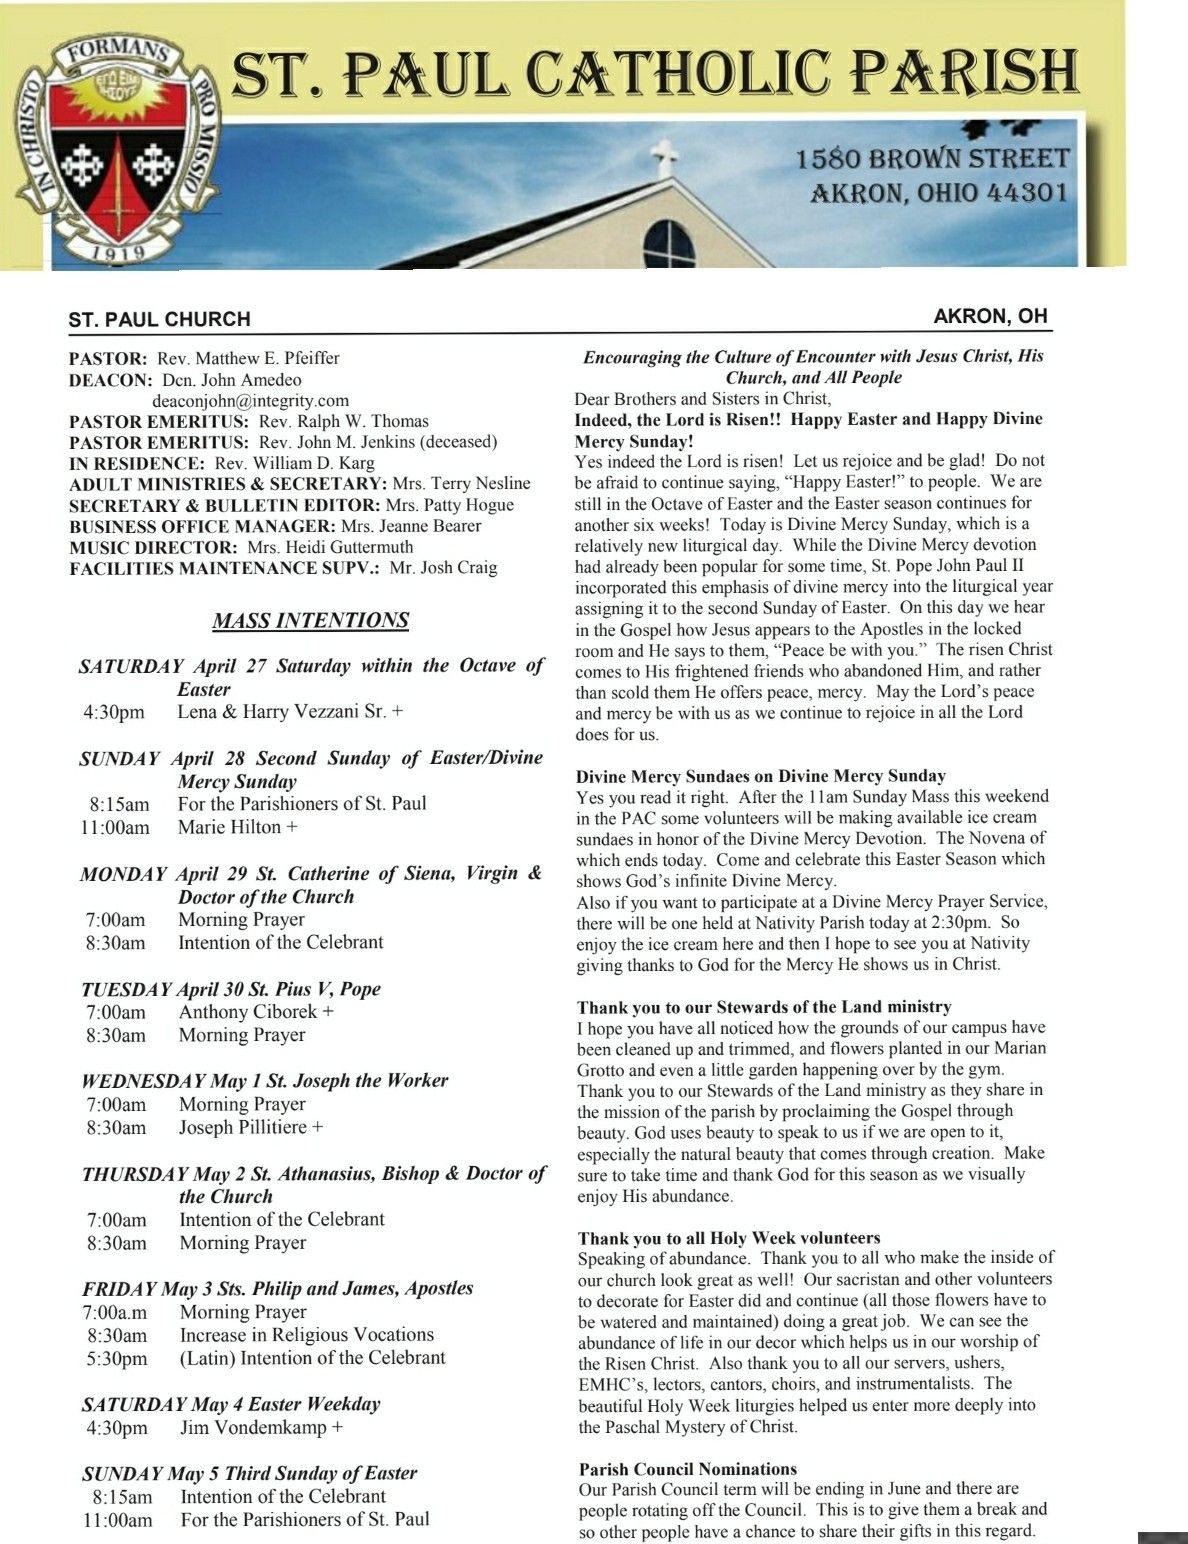 St Paul Catholic Parish Akron Ohio Bulletin Sunday April 28th